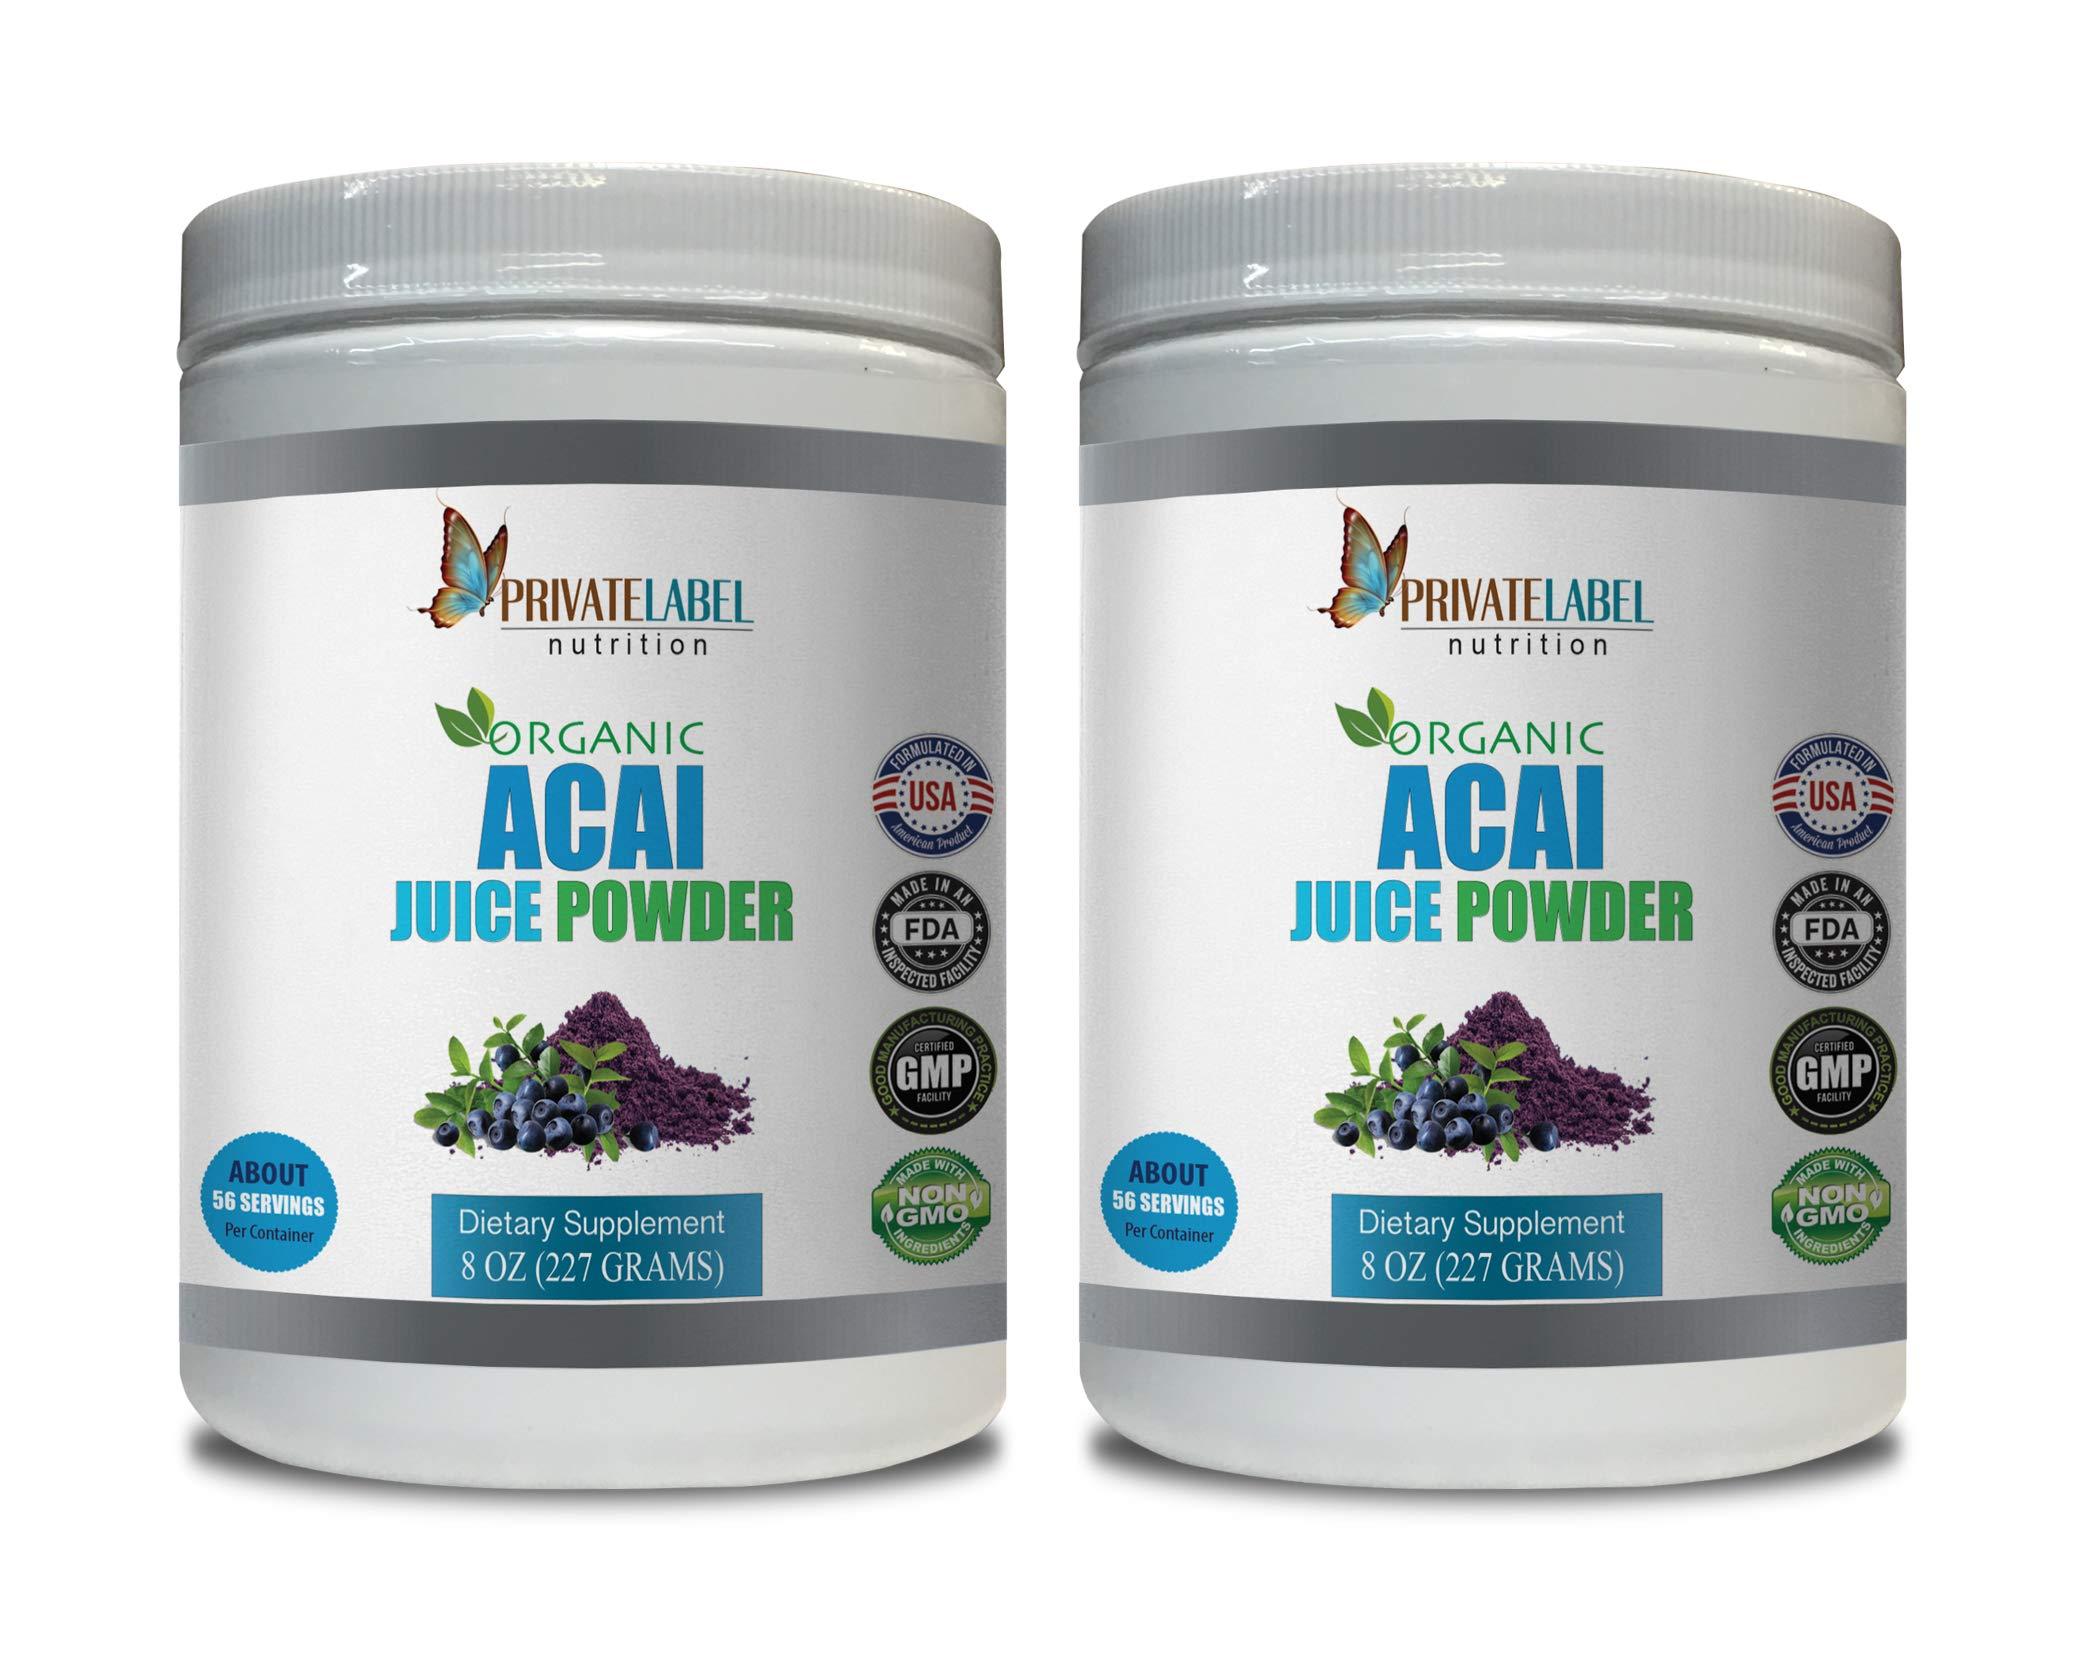 antioxidant Anti Aging - ACAI Organic Juice Powder - acai Supplement Organic - 2 Cans 16 OZ (130 Servings)